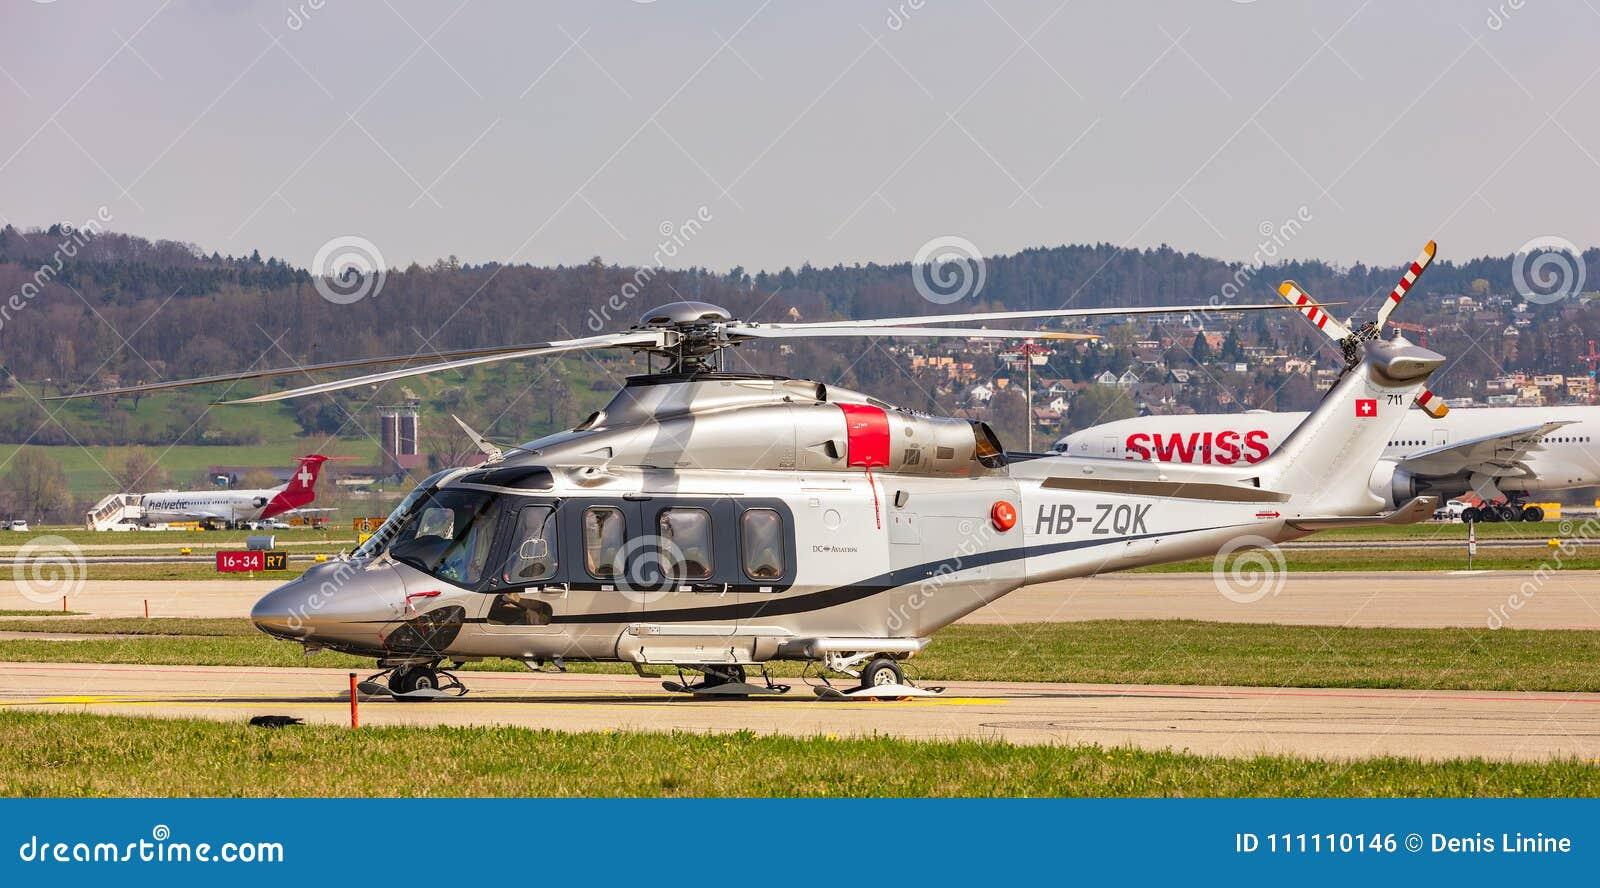 Elicottero 139 : Elicottero di agustawestland aw 139 allaeroporto di zurigo